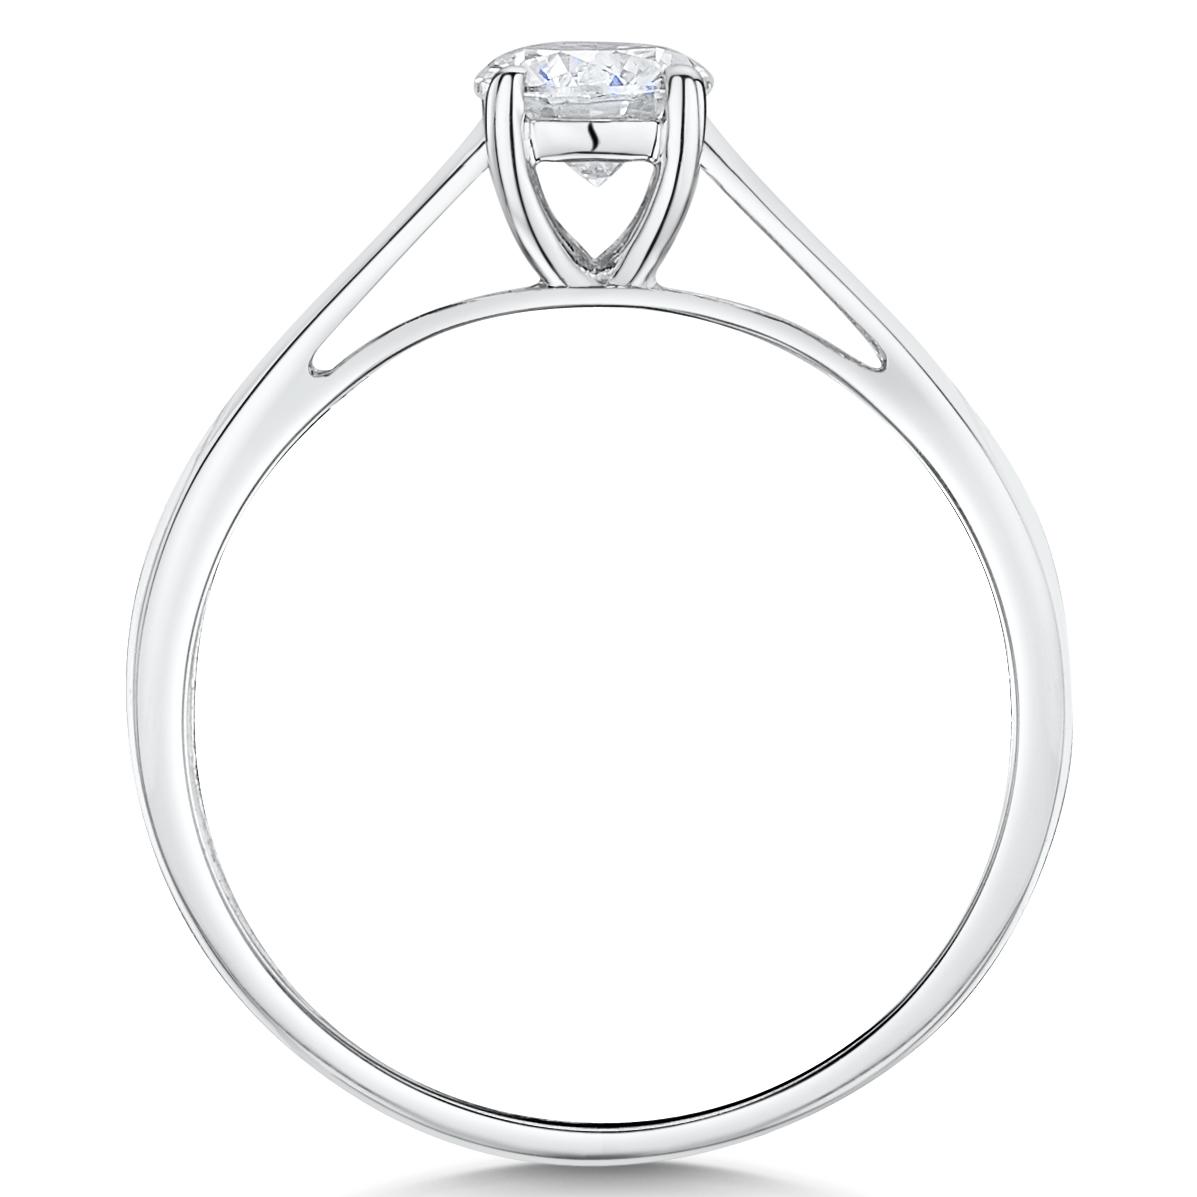 9ct White Gold Quarter Carat Diamond Solitaire Engagement